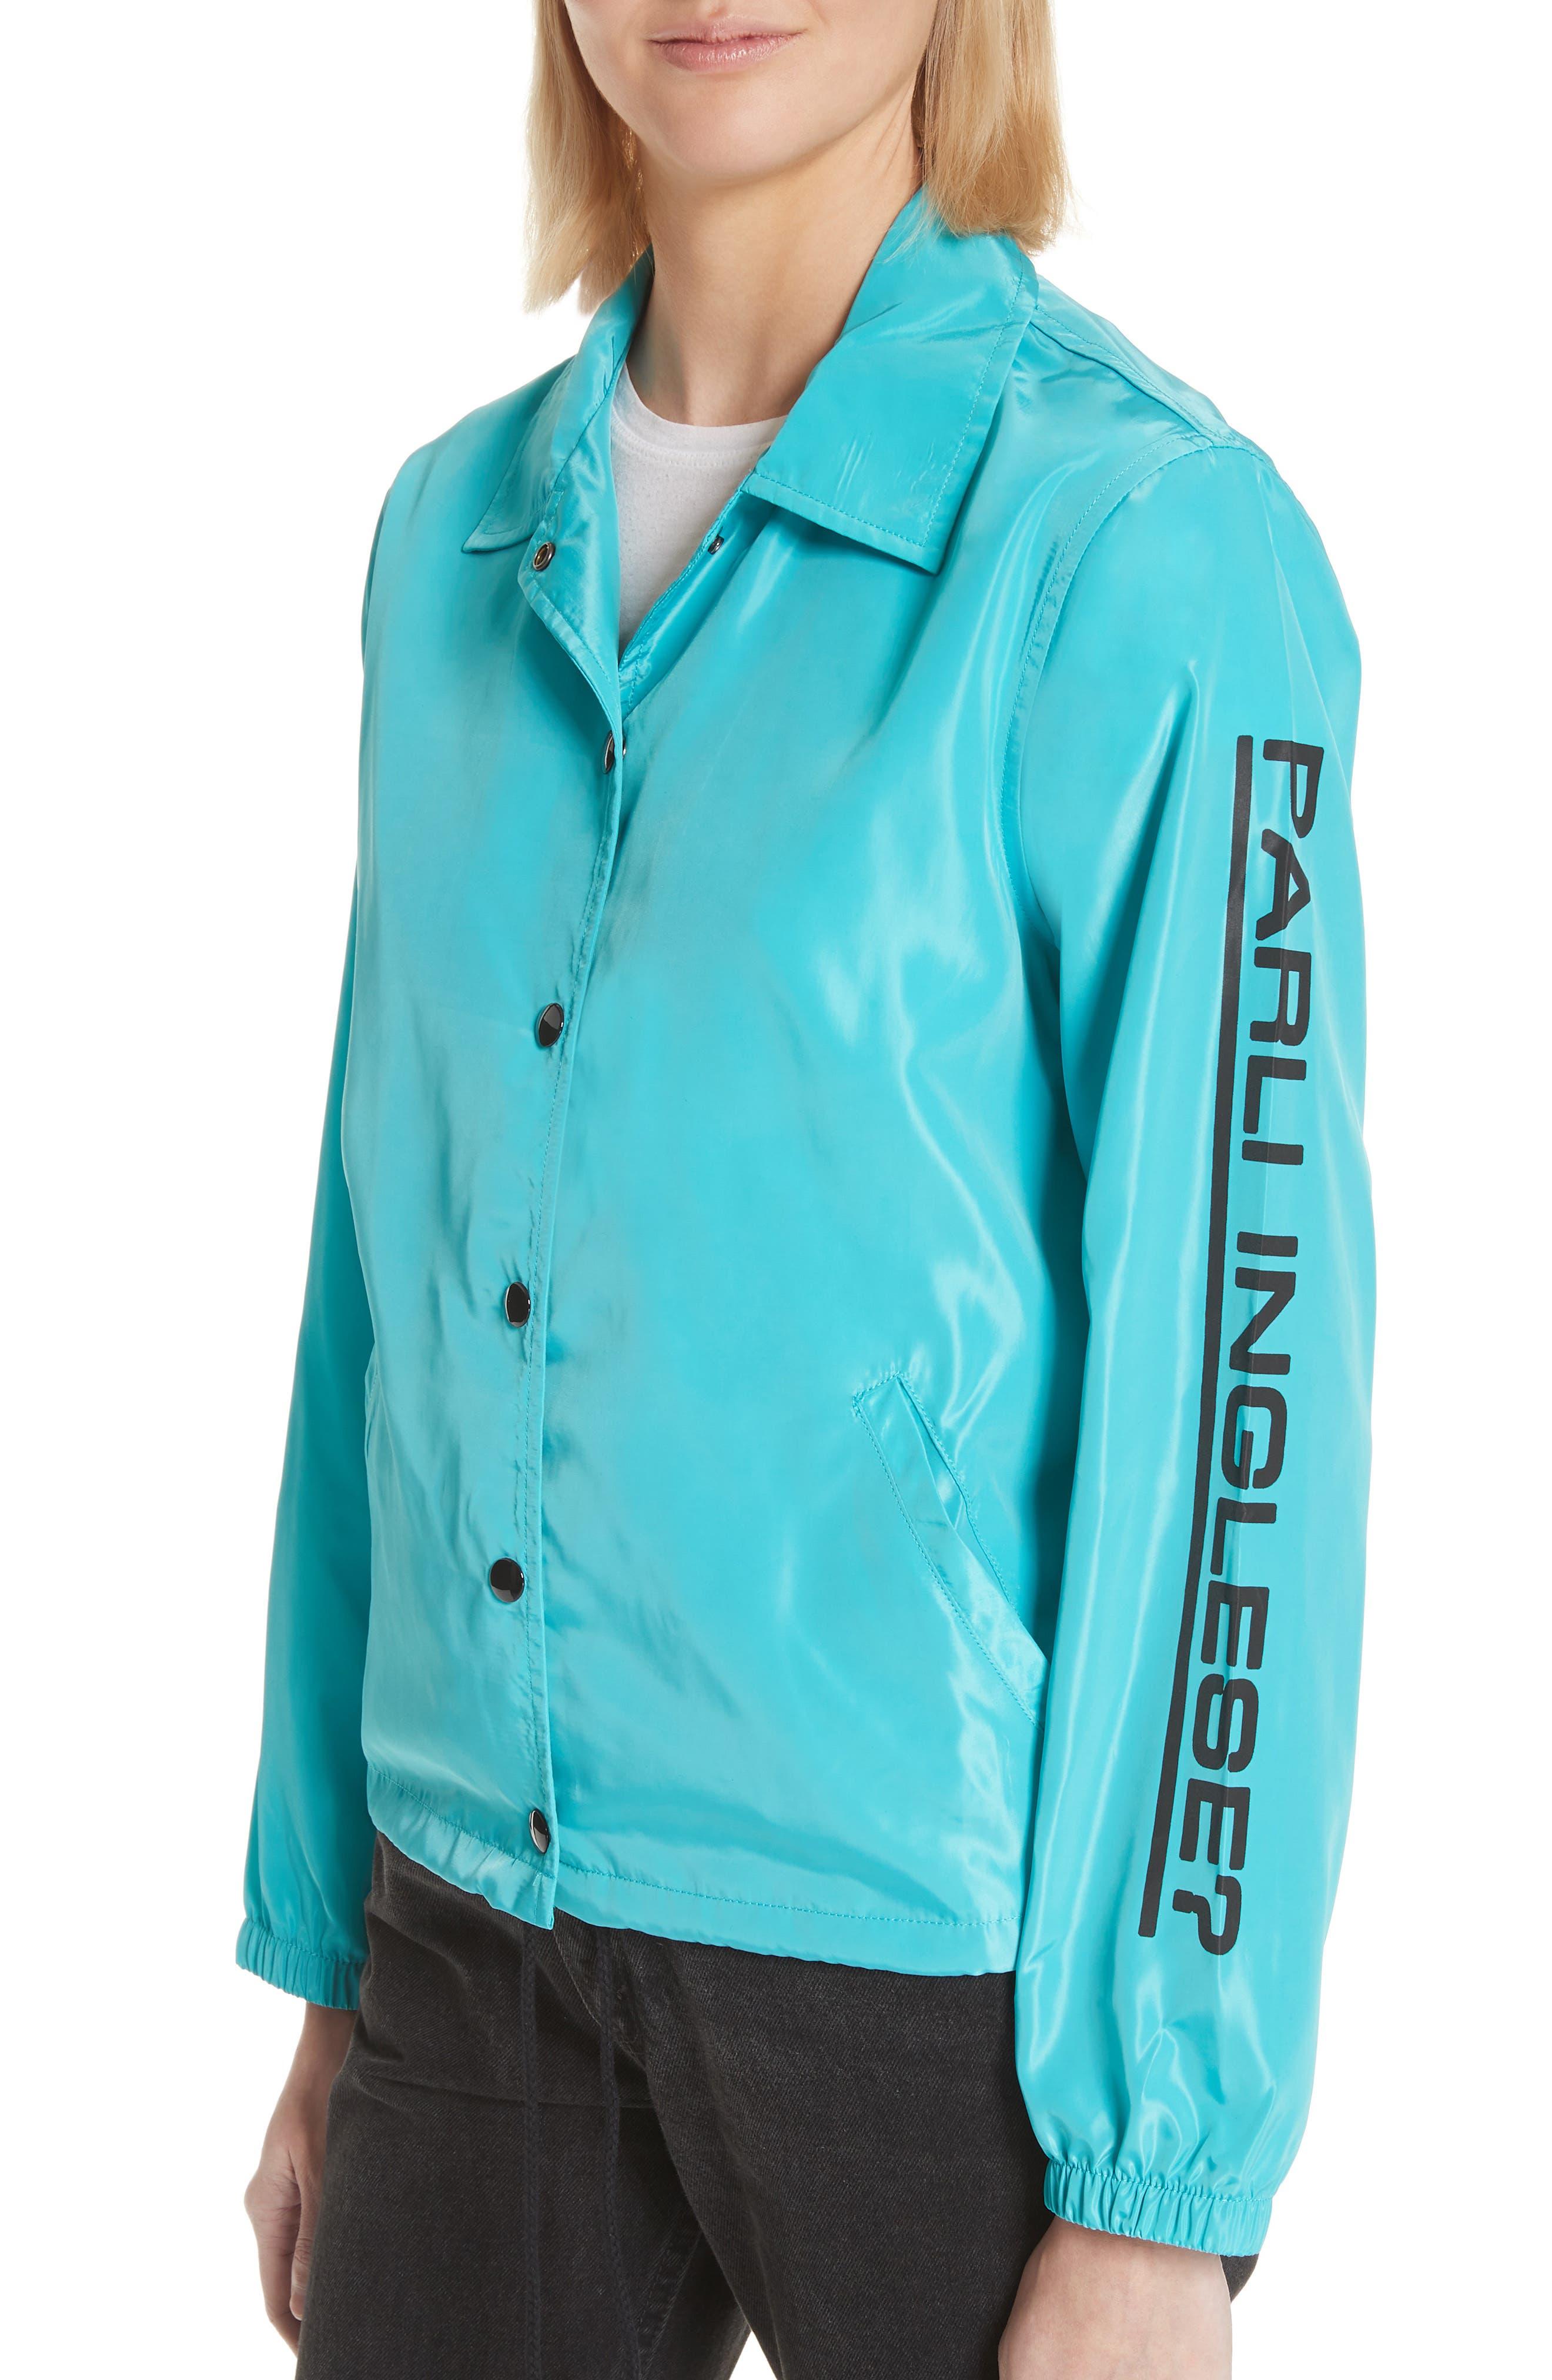 Parli Inglese Coach Jacket,                             Alternate thumbnail 4, color,                             Turquoise